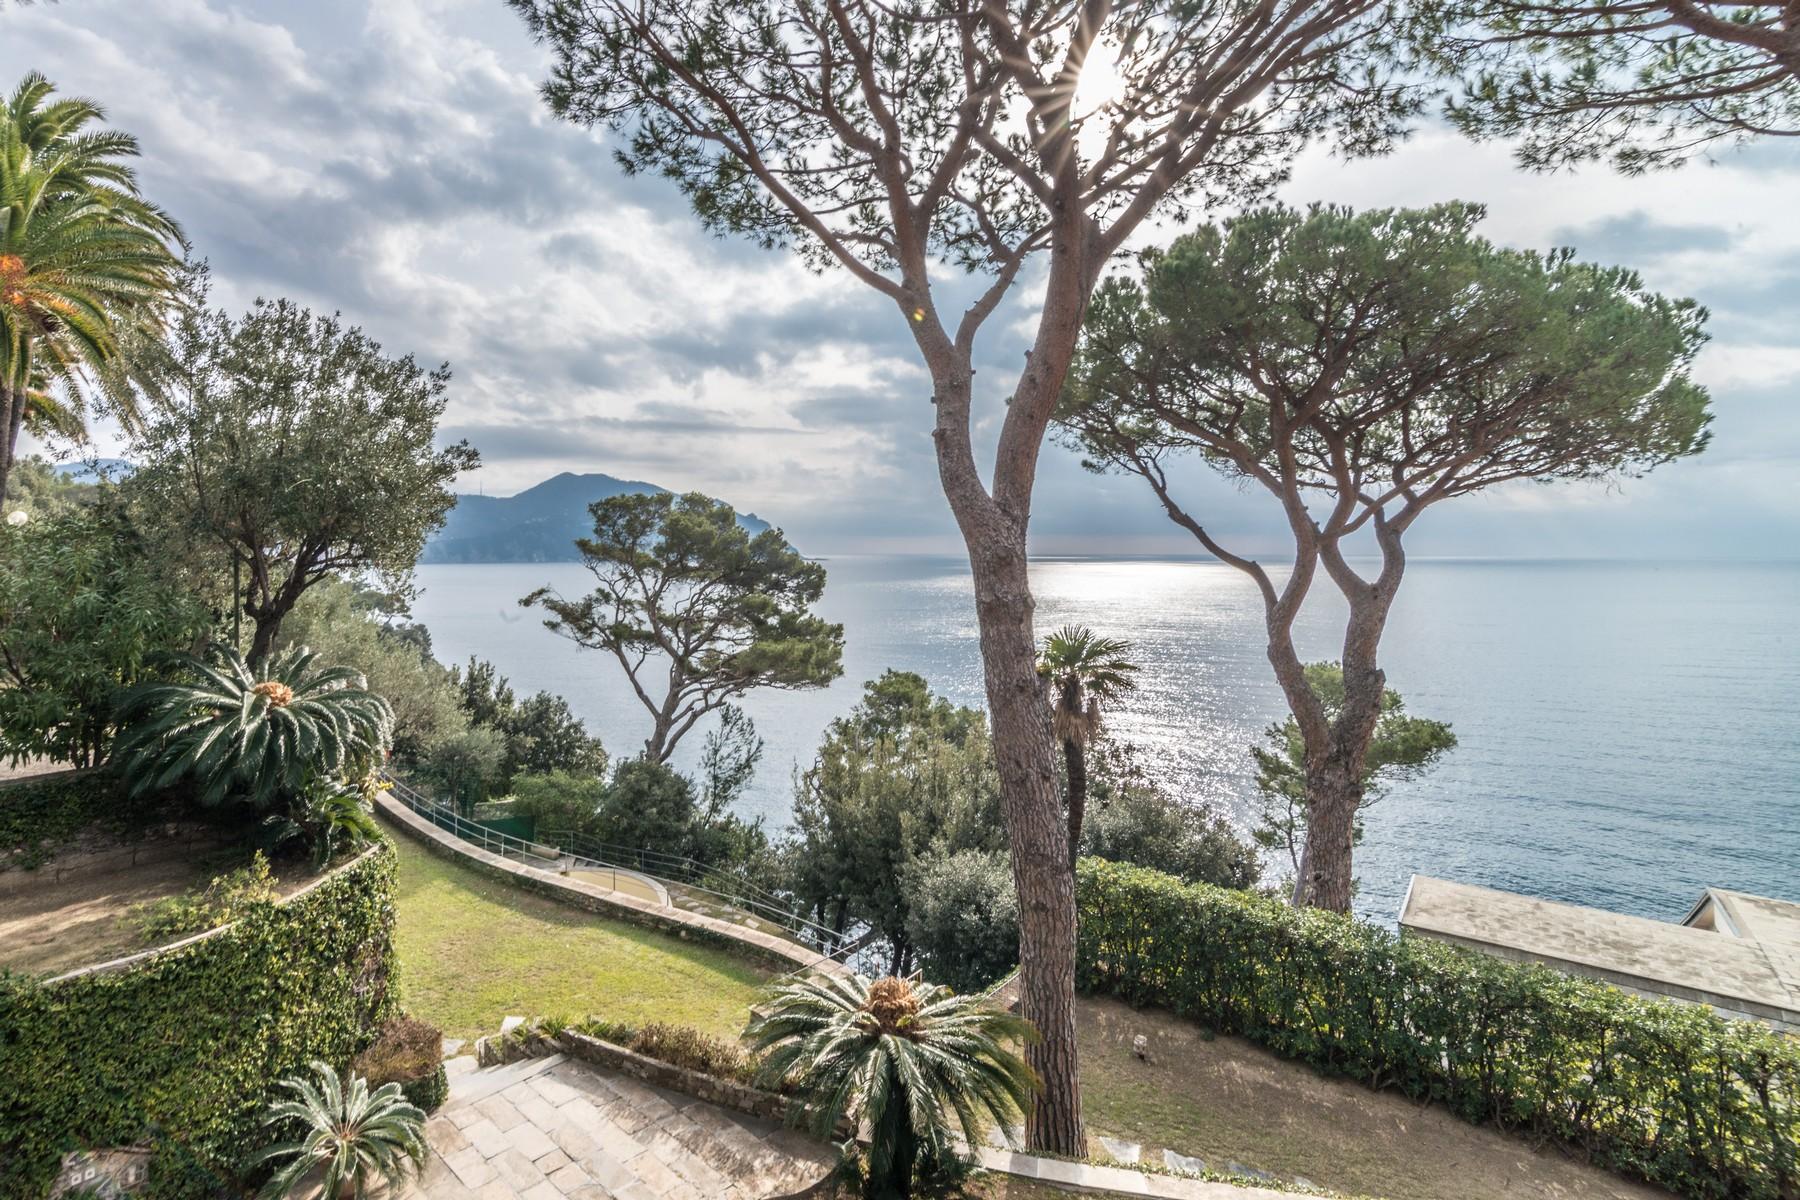 Villa in Vendita a Sori: 5 locali, 720 mq - Foto 6